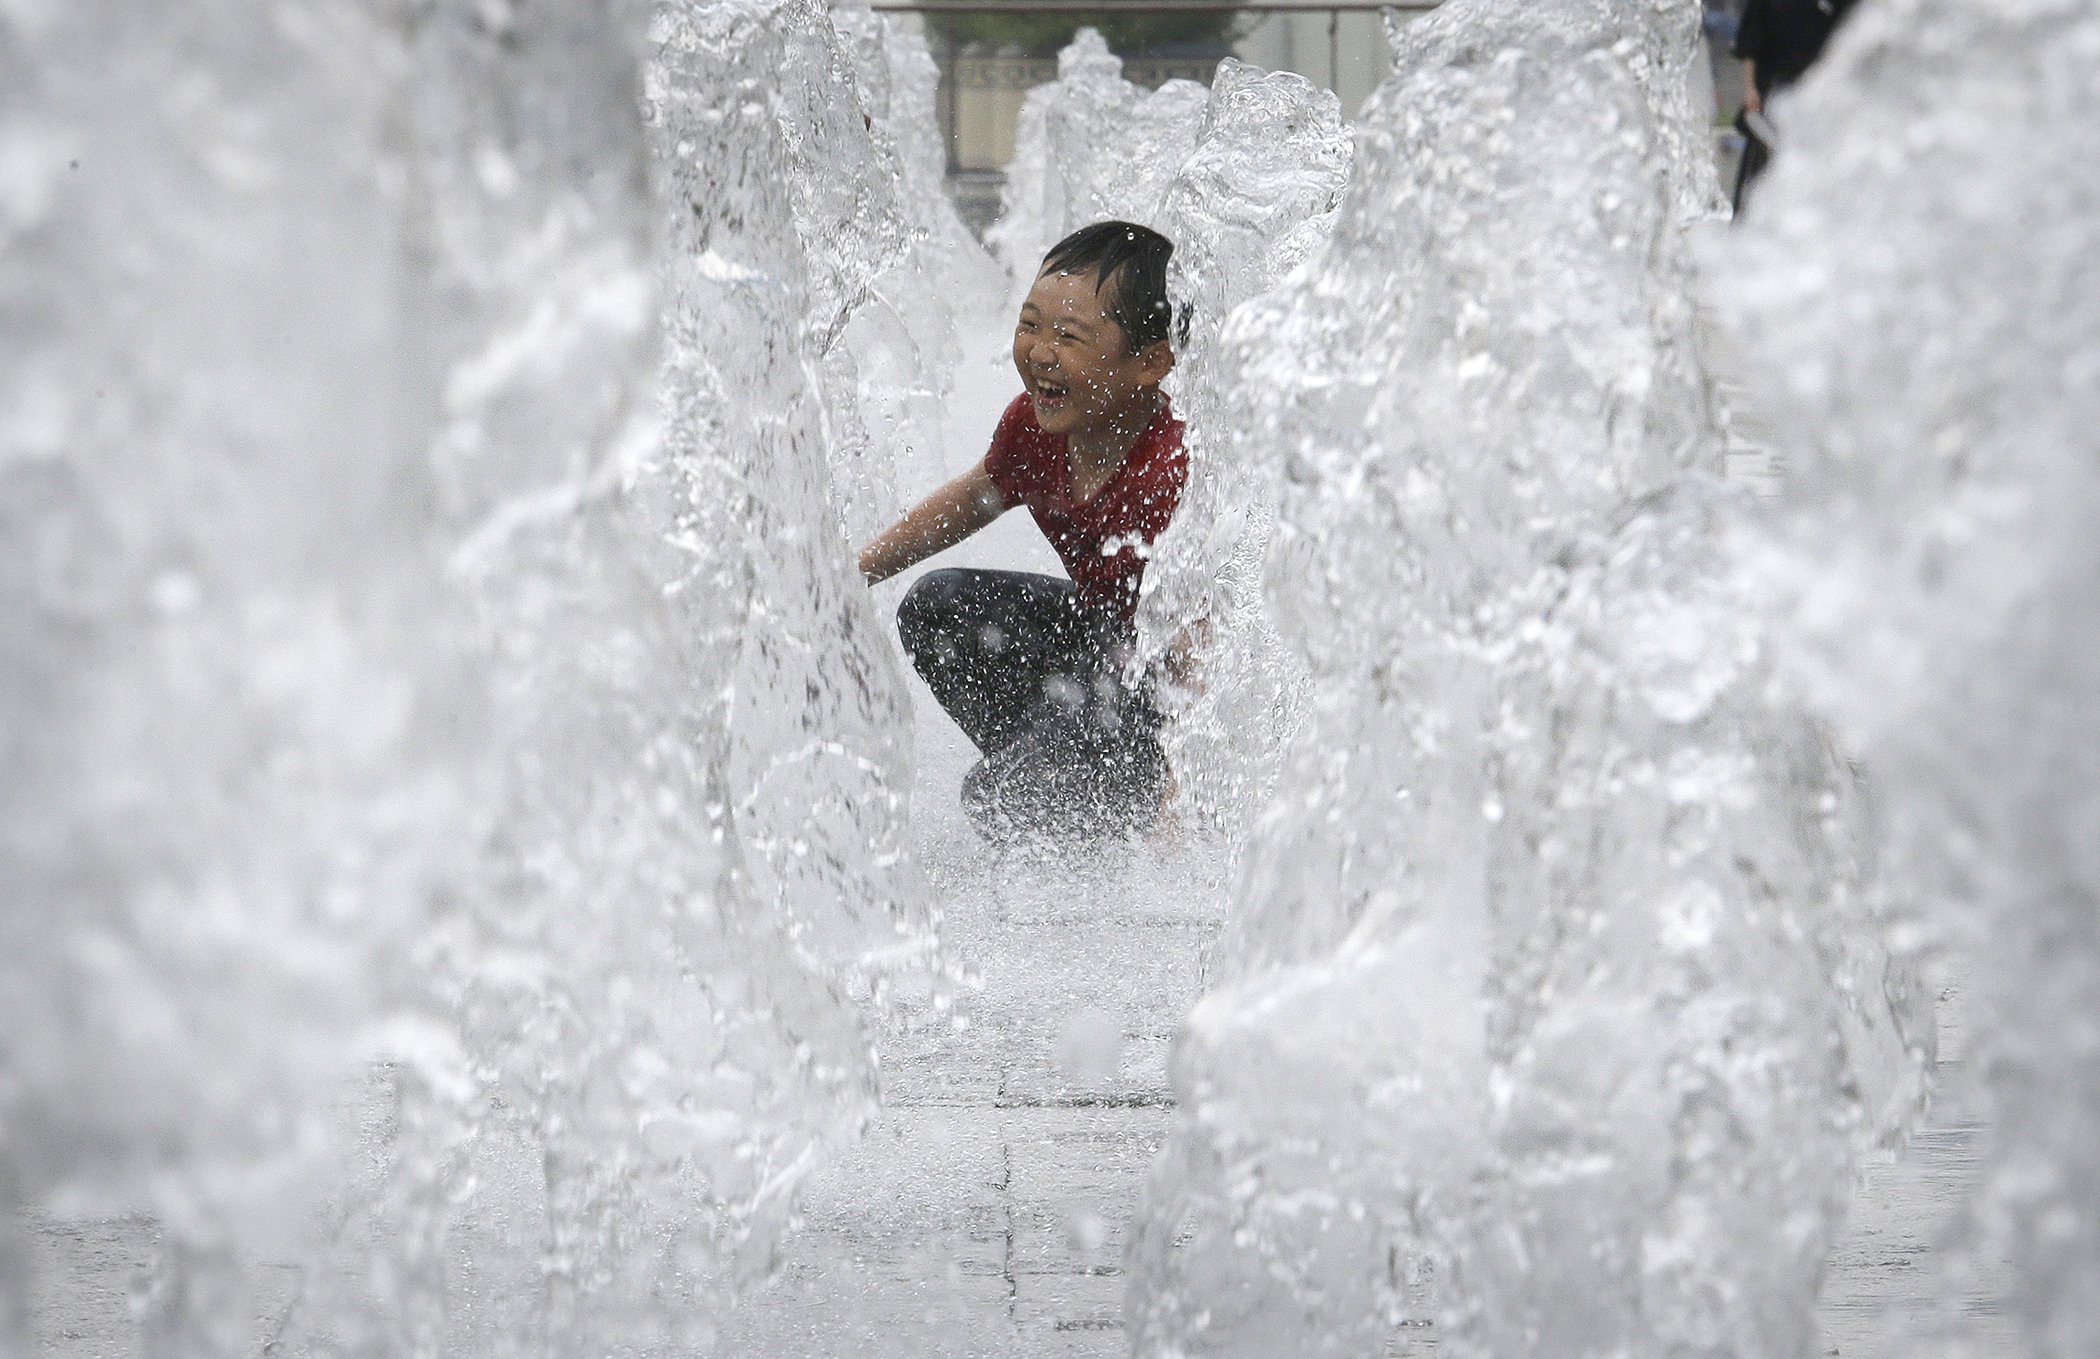 Environmental-Photos-July-SouthKorea-Heat.jpg